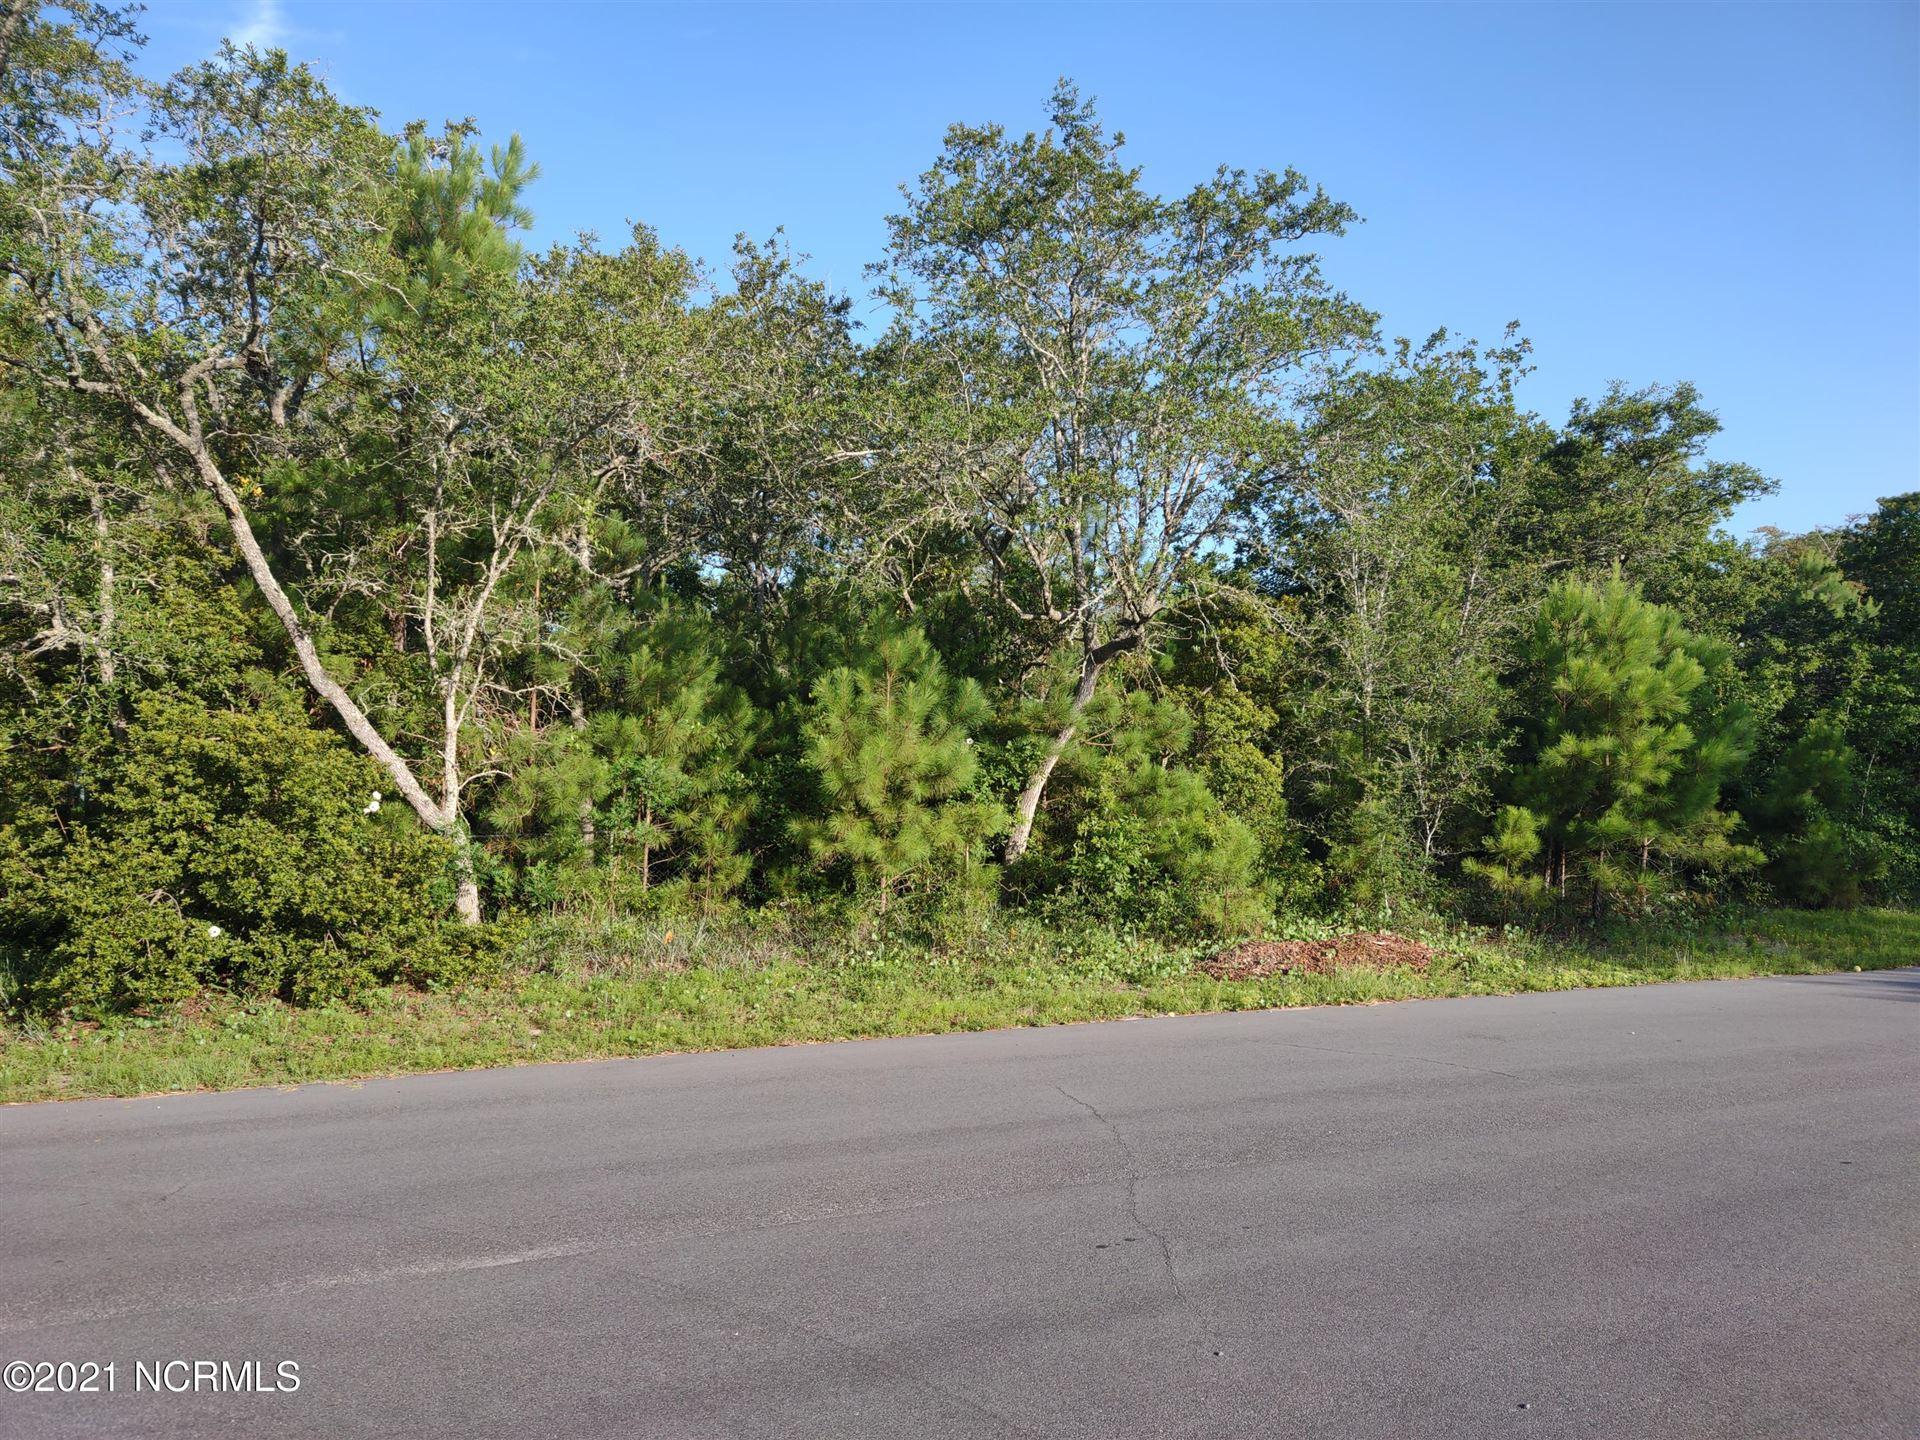 Photo for 137 NE 73rd Street, Oak Island, NC 28465 (MLS # 100282749)